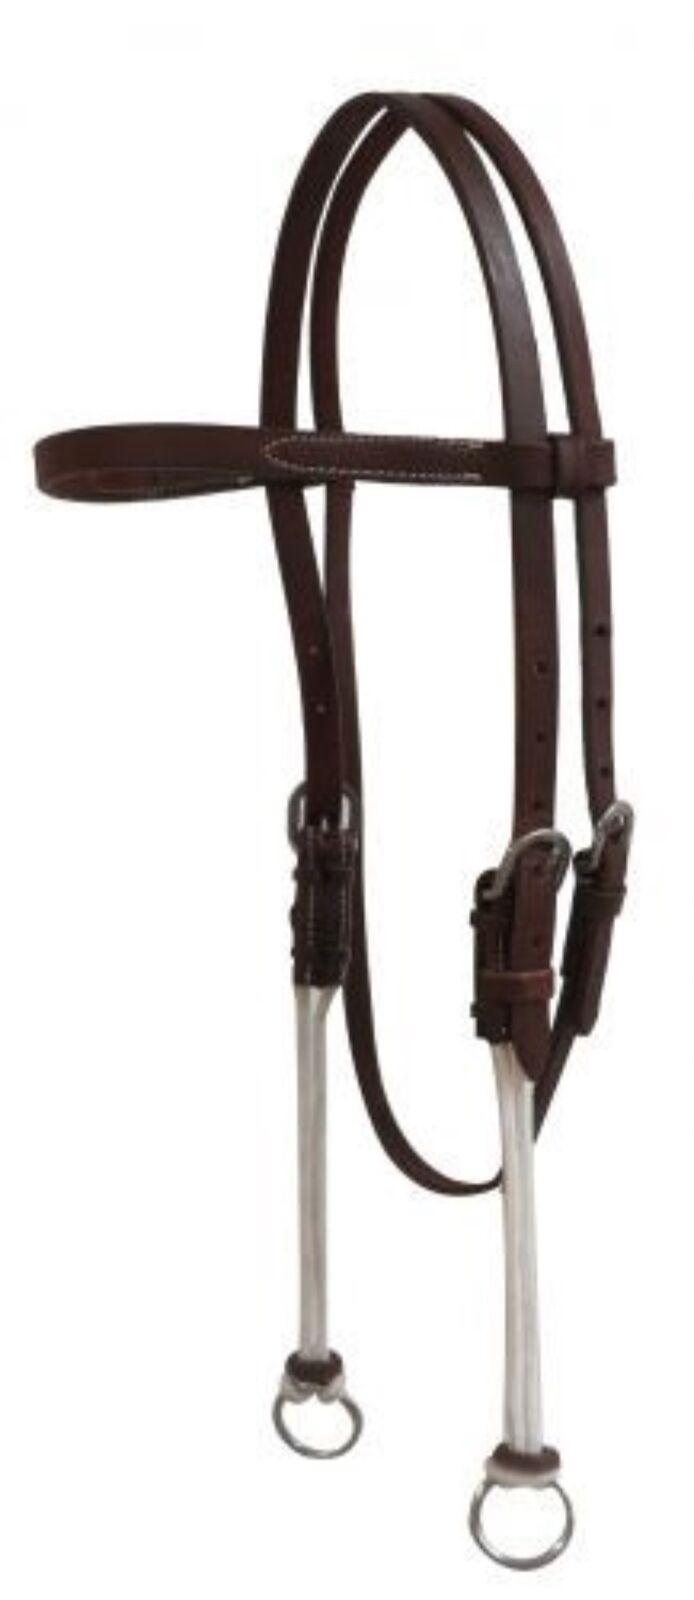 Showman RED Premium Nylon One Ear Western Headstall NEW HORSE TACK!